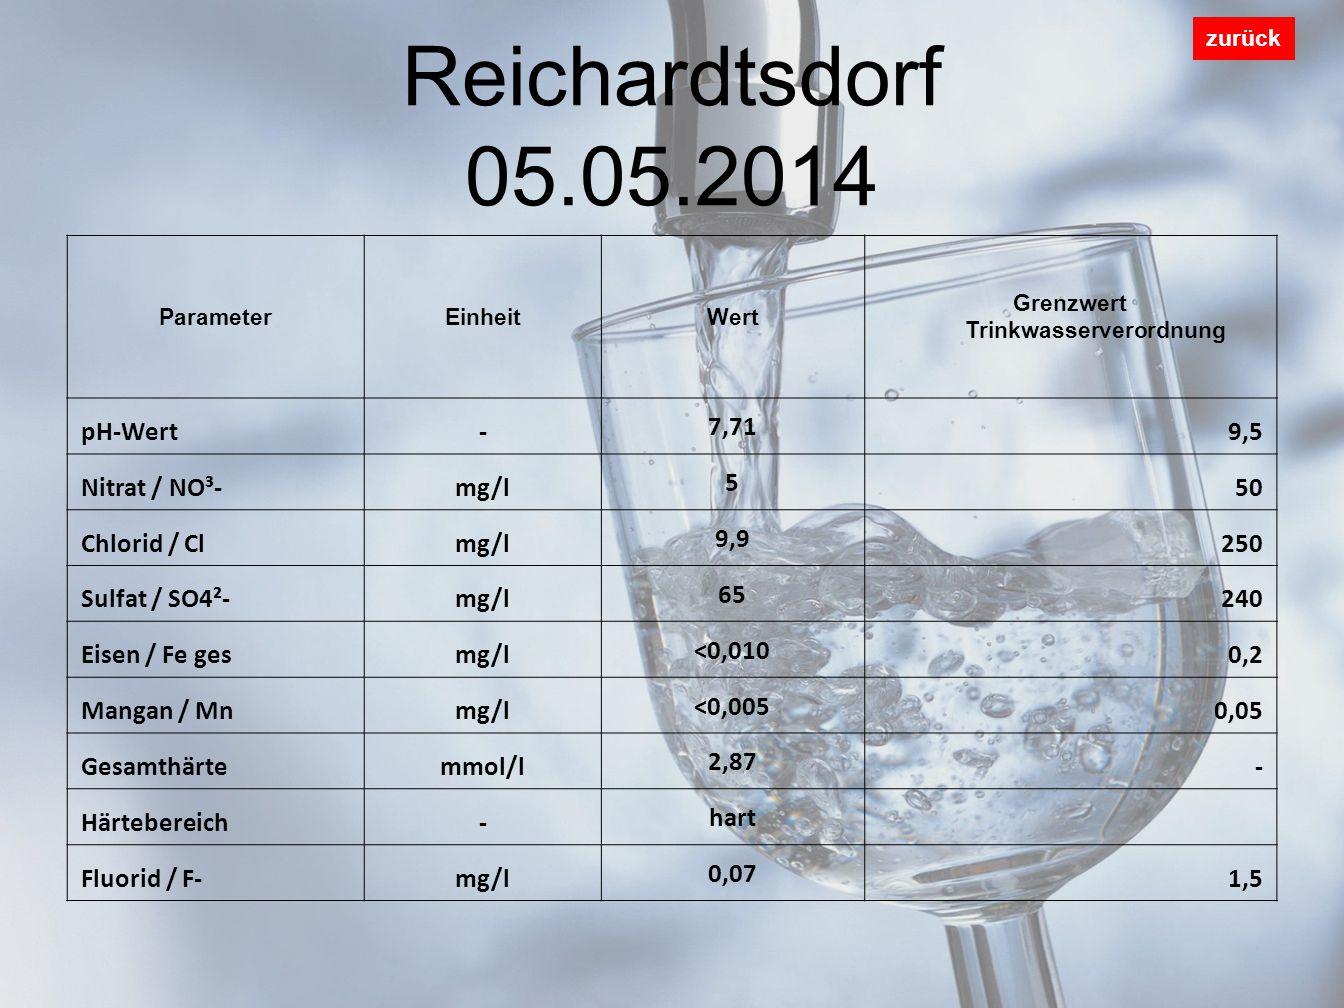 Reichardtsdorf 05.05.2014 zurück ParameterEinheitWert Grenzwert Trinkwasserverordnung pH-Wert- 7,71 9,5 Nitrat / NO³-mg/l 5 50 Chlorid / Clmg/l 9,9 250 Sulfat / SO4²-mg/l 65 240 Eisen / Fe gesmg/l <0,010 0,2 Mangan / Mnmg/l <0,005 0,05 Gesamthärtemmol/l 2,87 - Härtebereich- hart Fluorid / F-mg/l 0,07 1,5